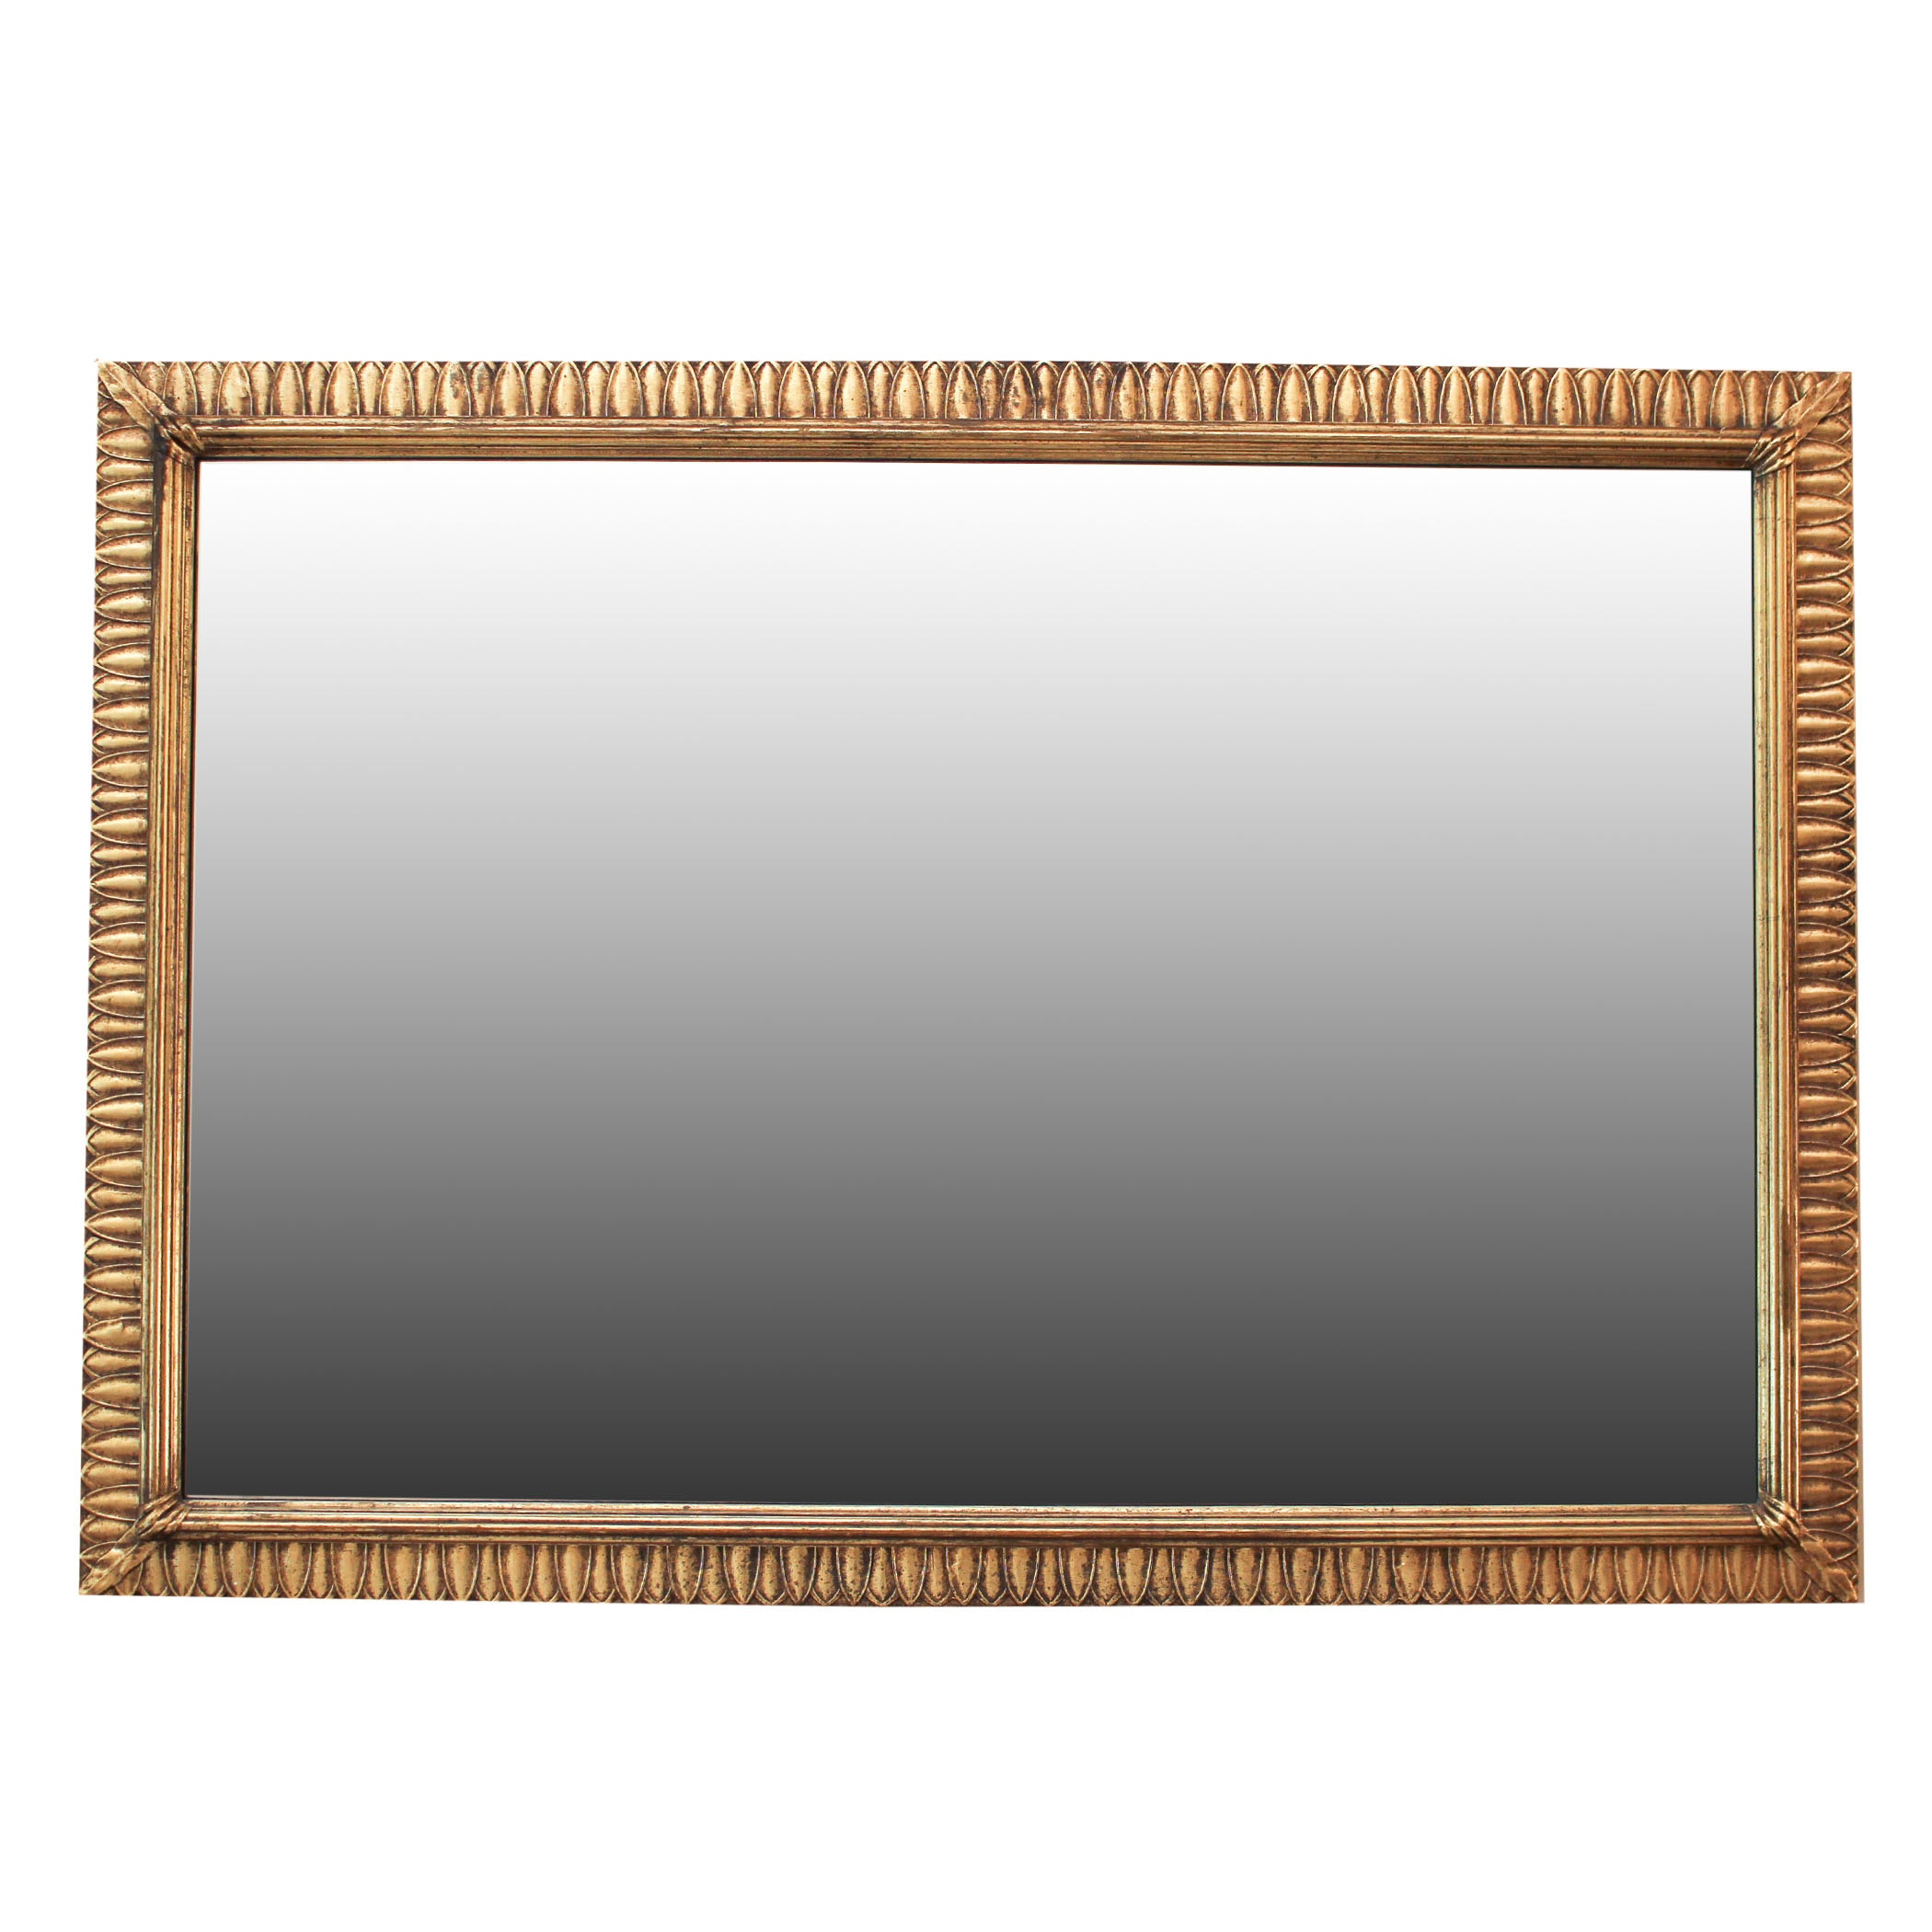 Gold Tone Wall Mirror